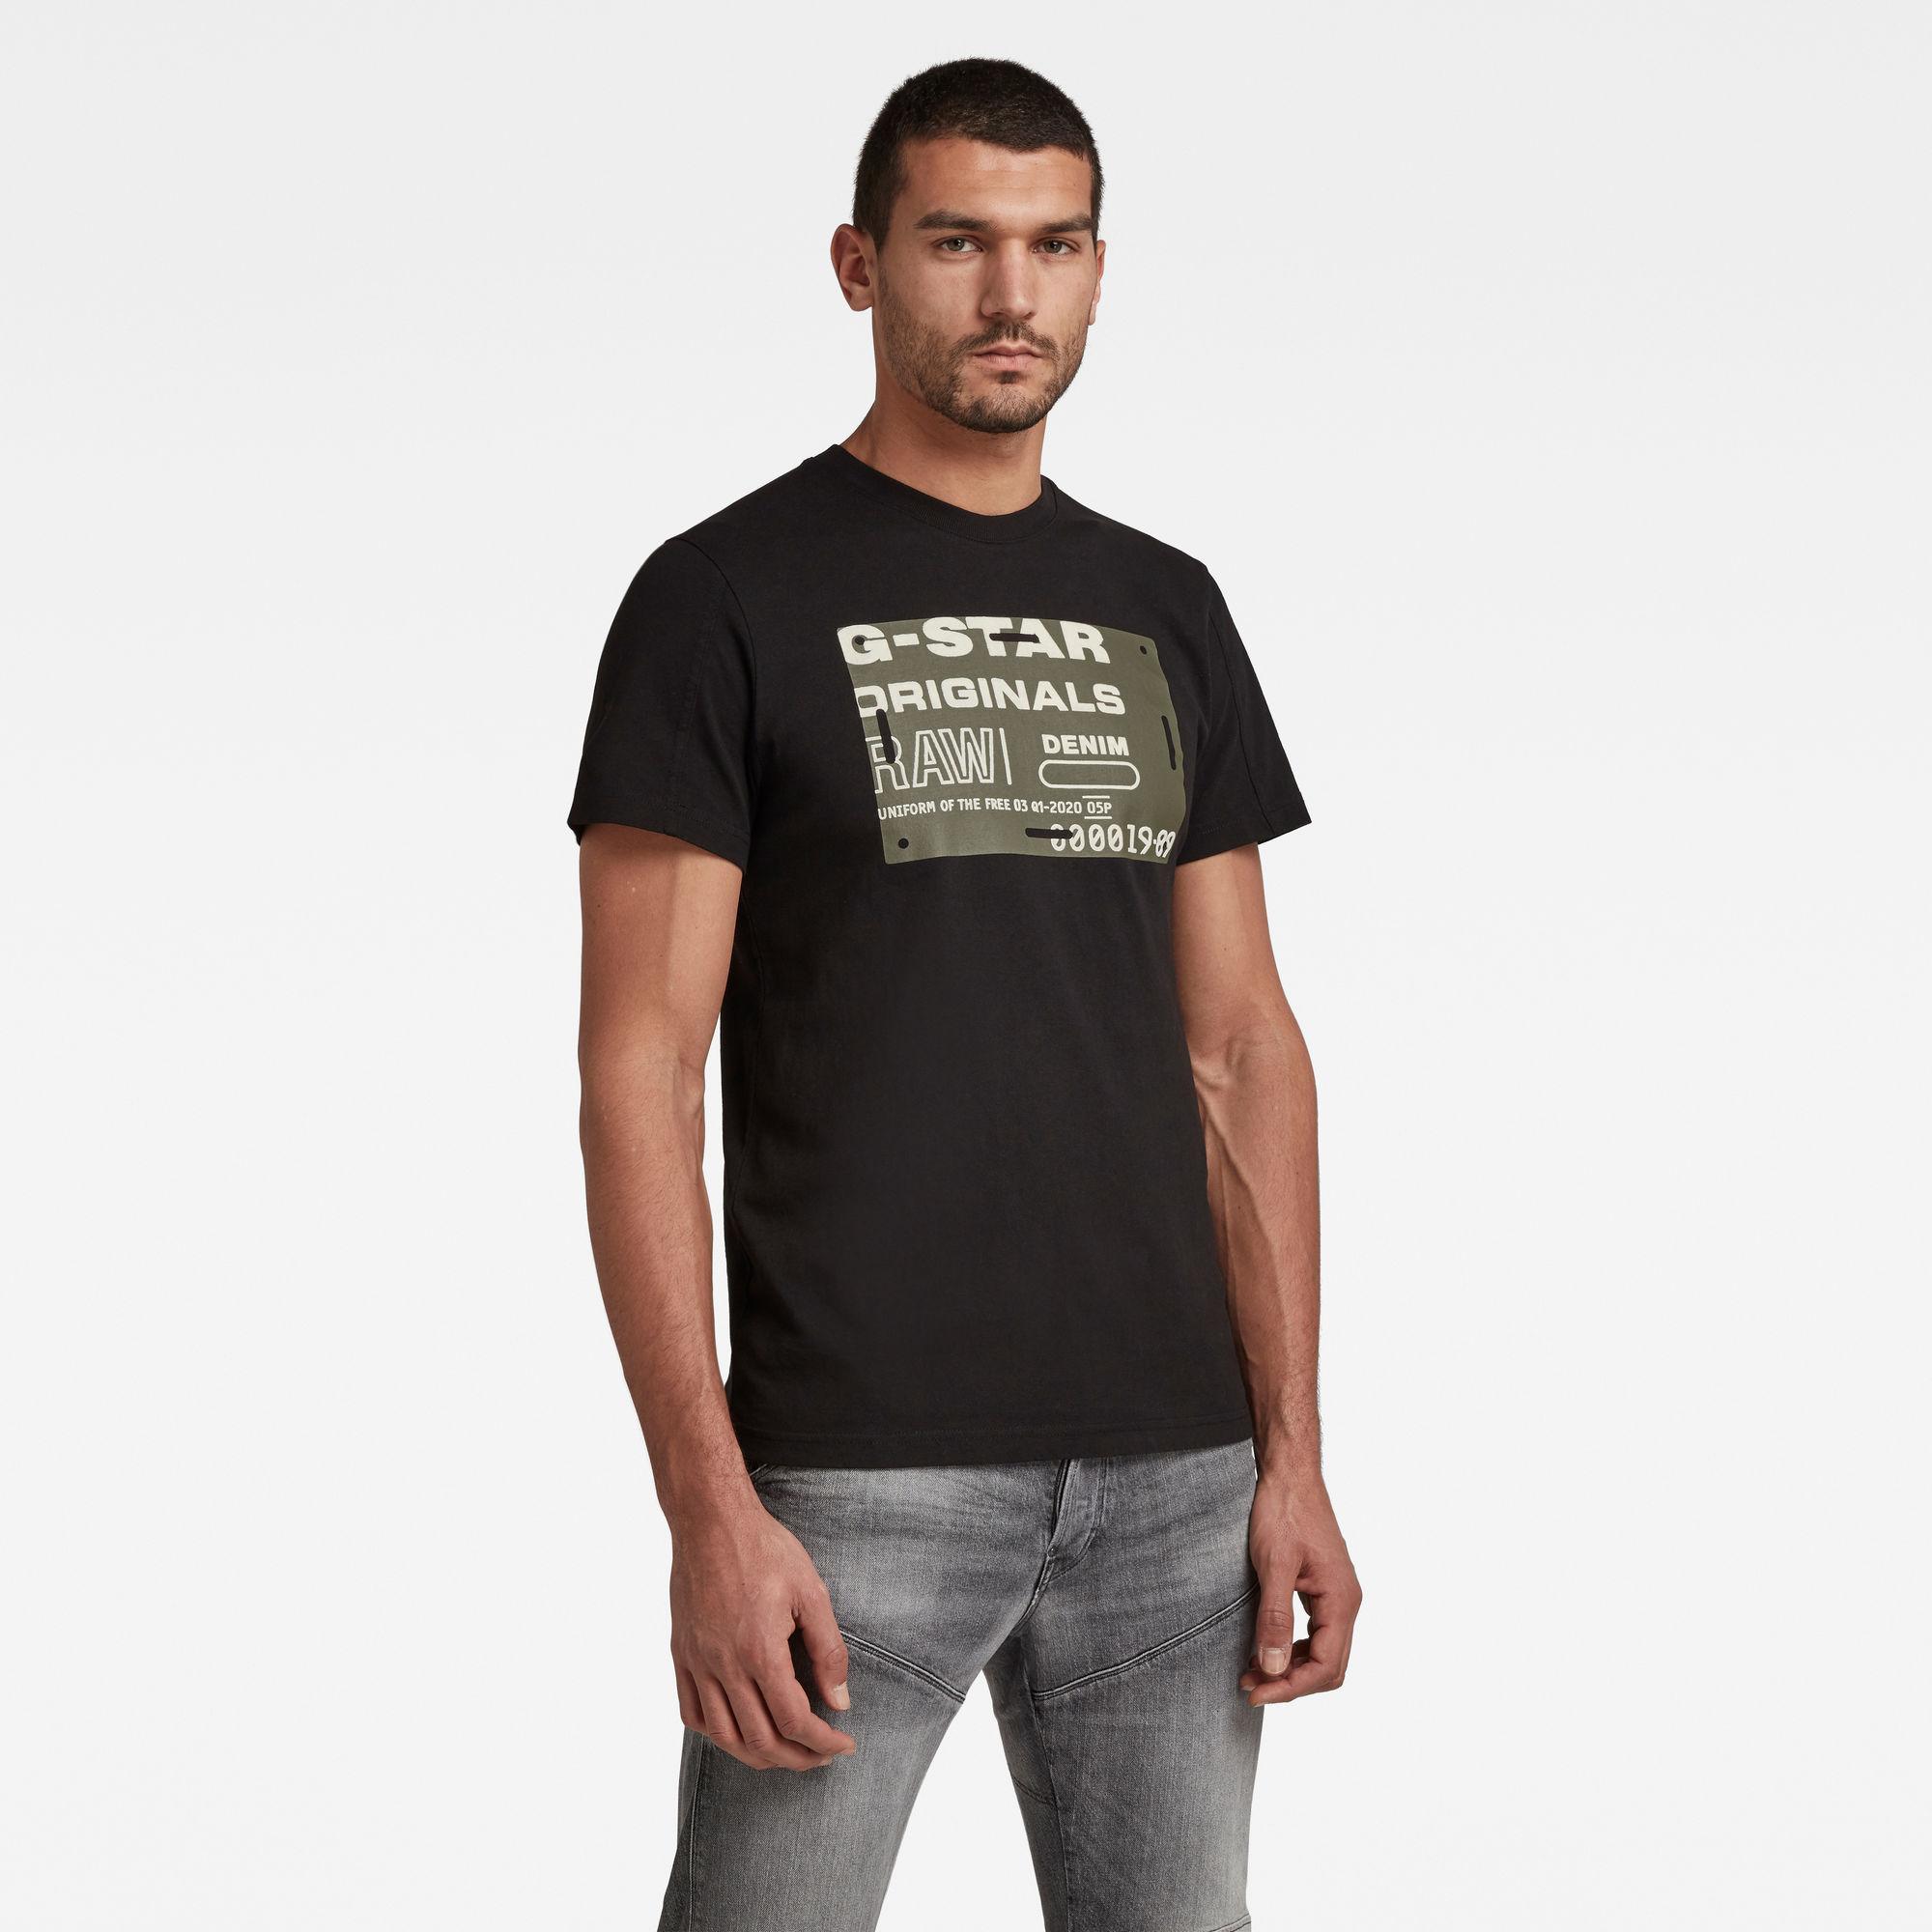 G-Star RAW Heren Flock Badge Graphic T-Shirt Zwart